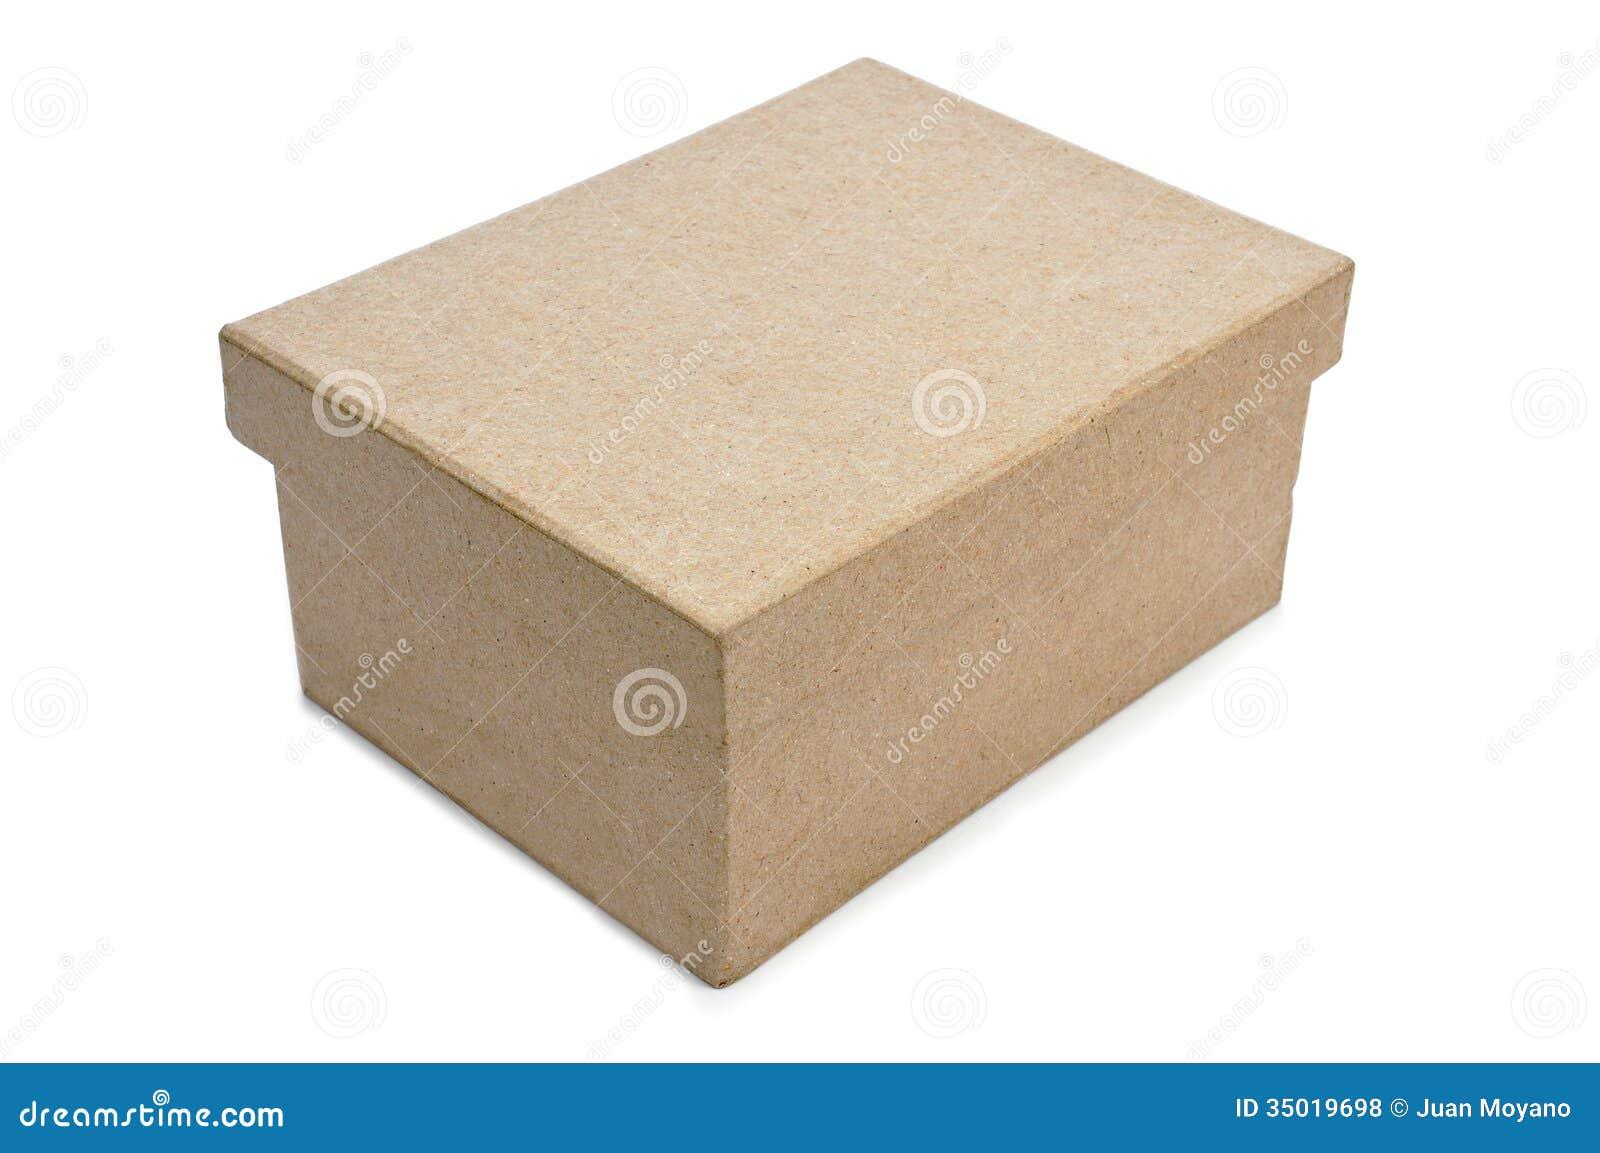 cardboard box royalty free stock photos image 35019698